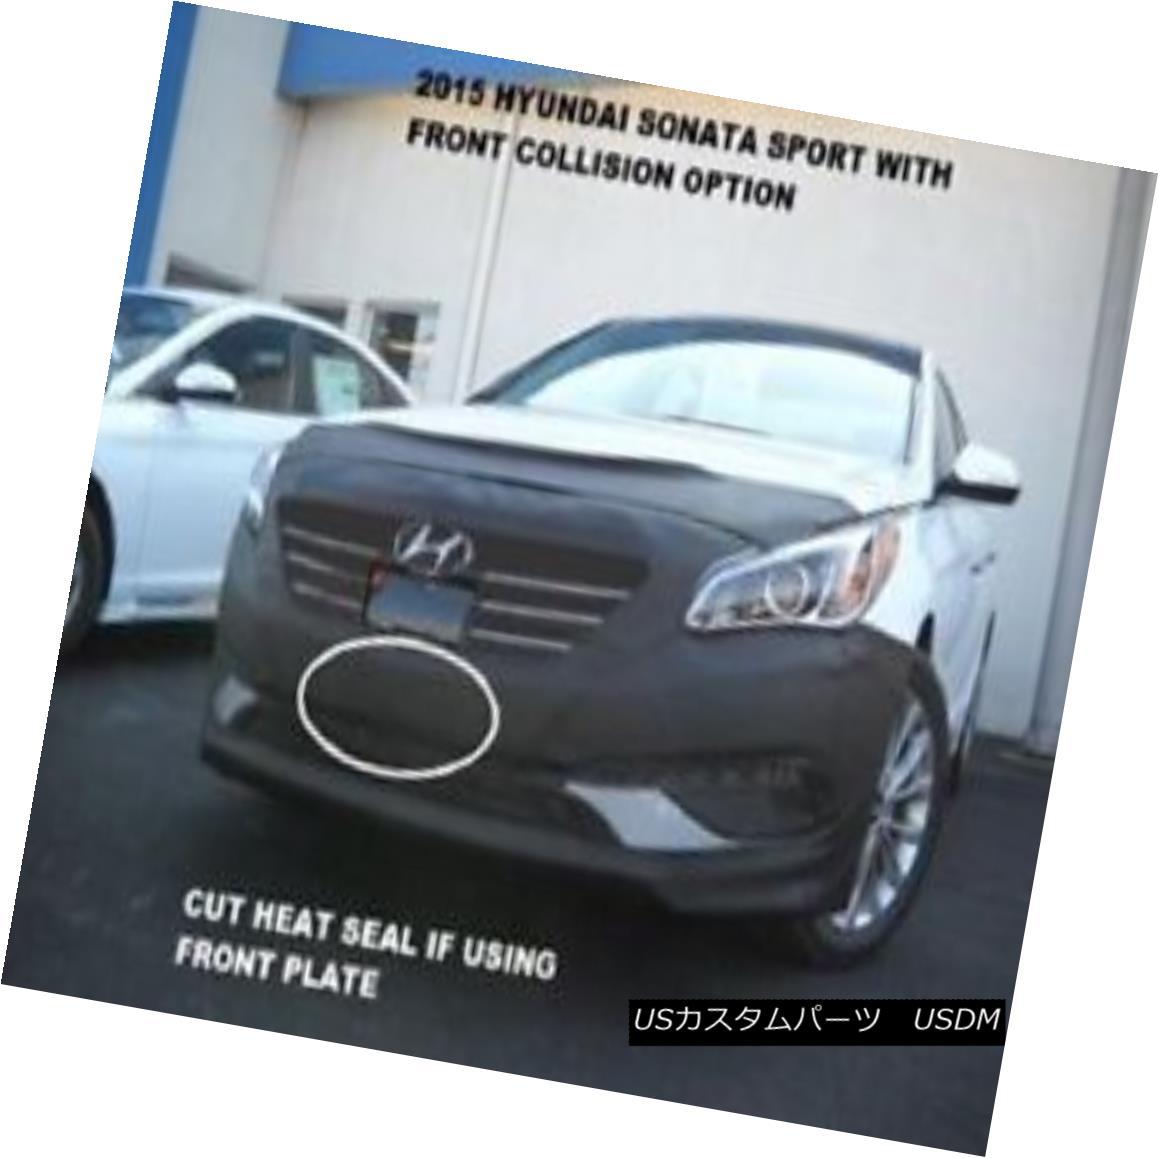 Car Mask Bra Lebra 2 piece Front End Cover Black Fits 2015 Hyundai Sonata